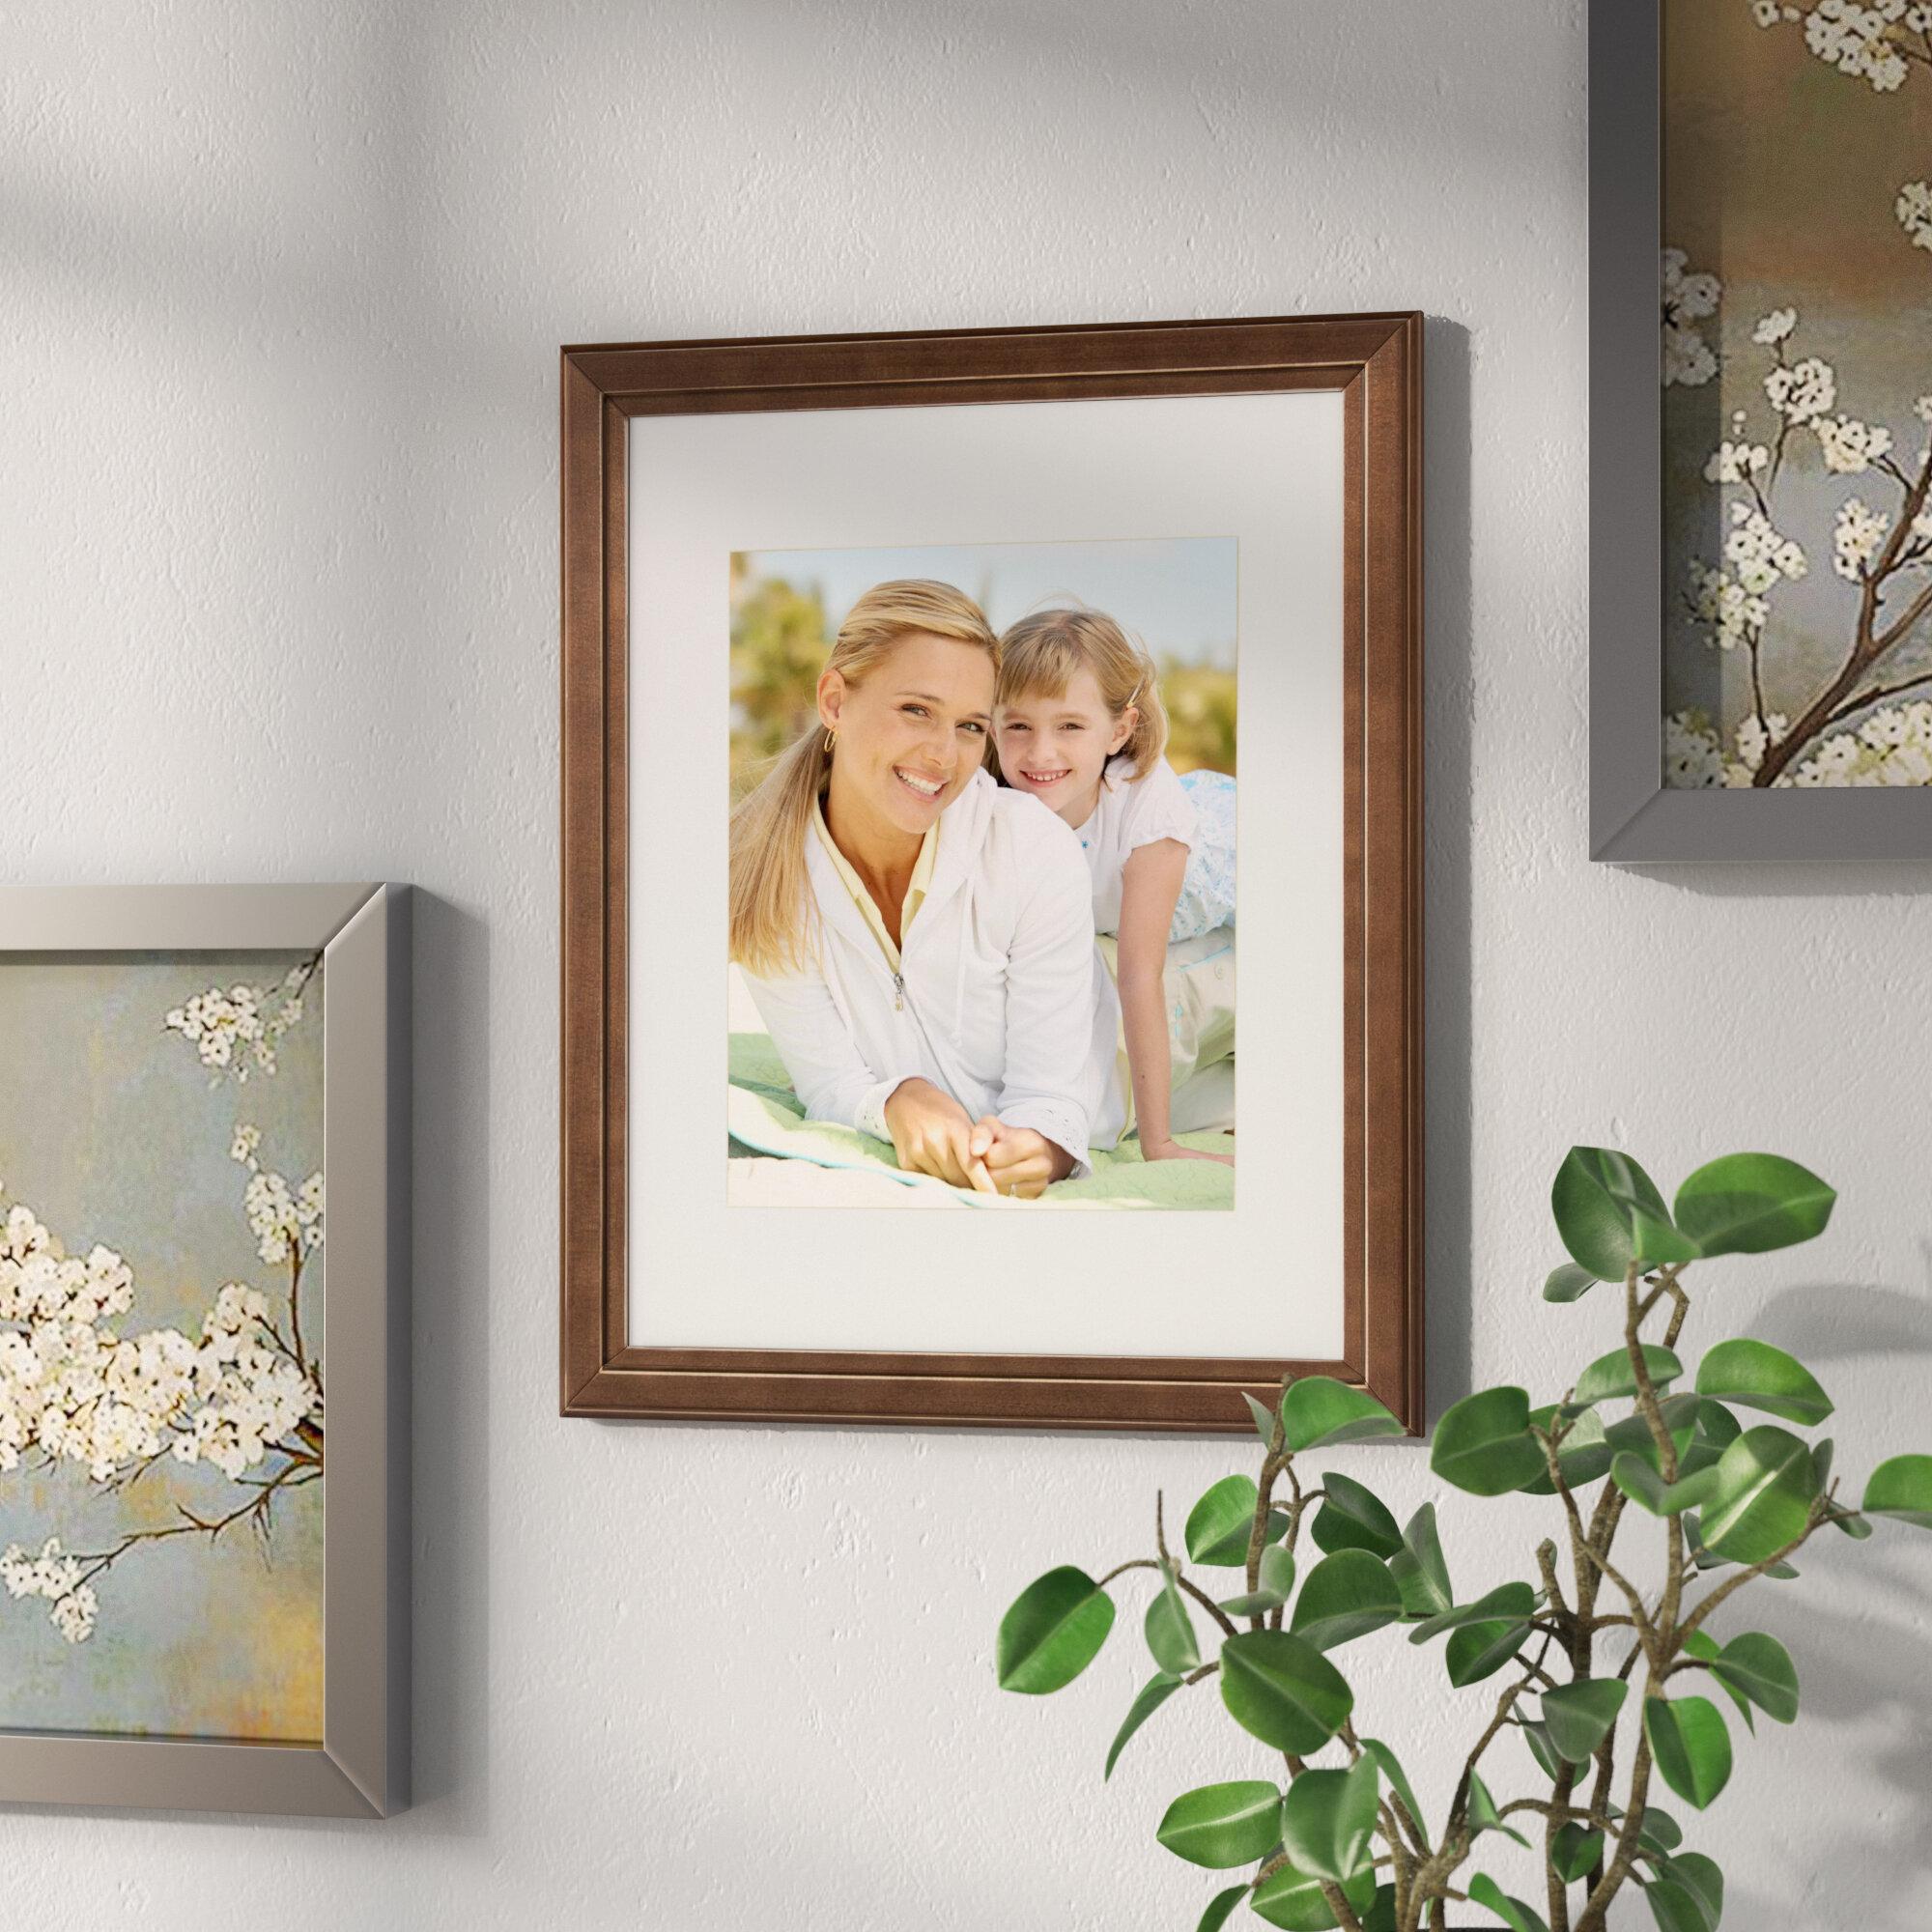 Red Barrel Studio Solid Wood Picture Frame & Reviews | Wayfair